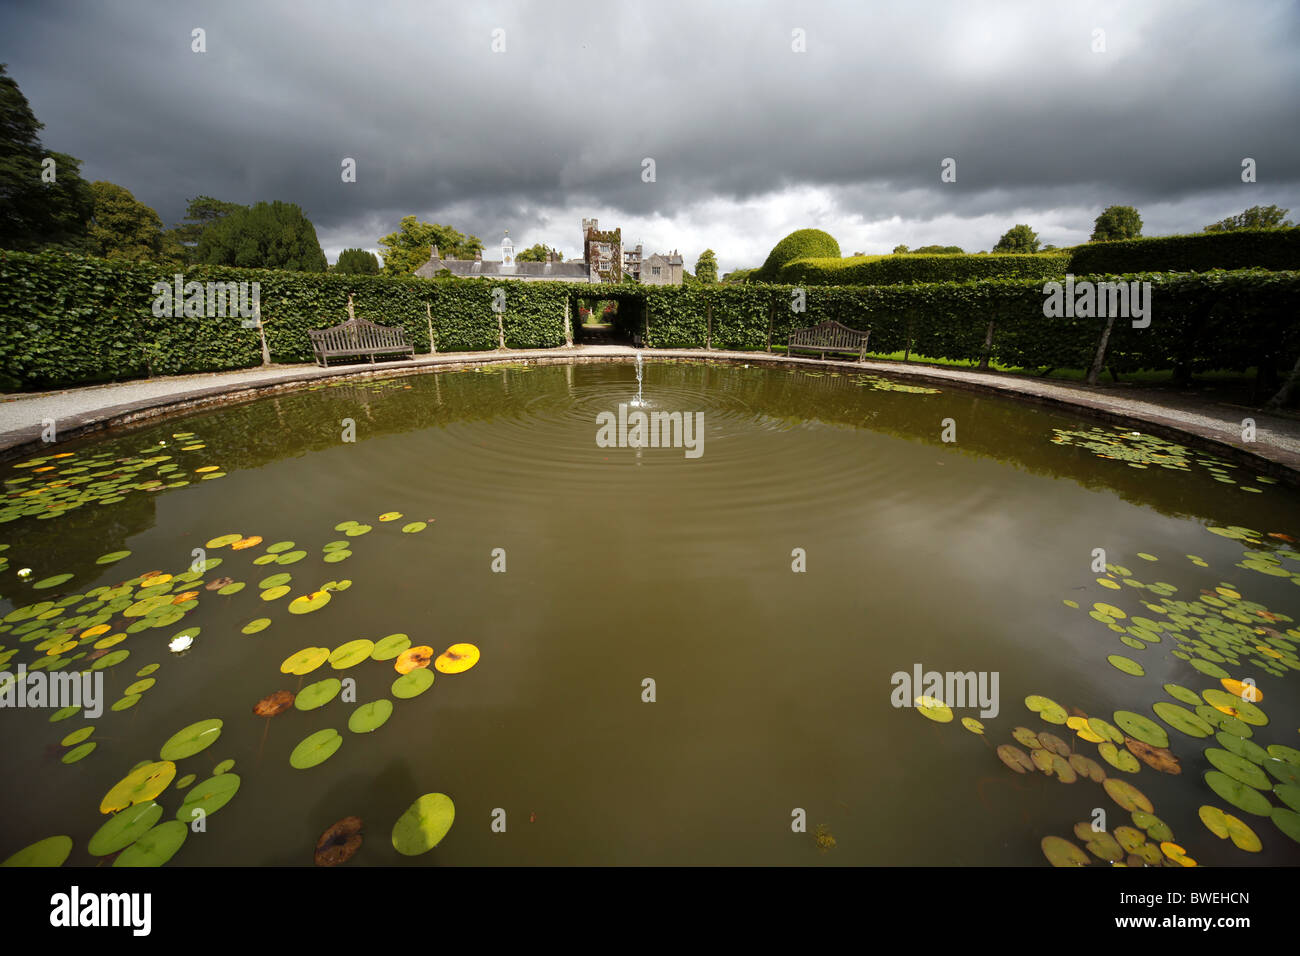 Wasser-Lilien im Teich LEVENS HALL KENDAL, CUMBRIA LEVENS HALL CUMBRIA ENGLAND KENDAL, CUMBRIA ENGLAND 17. August Stockbild